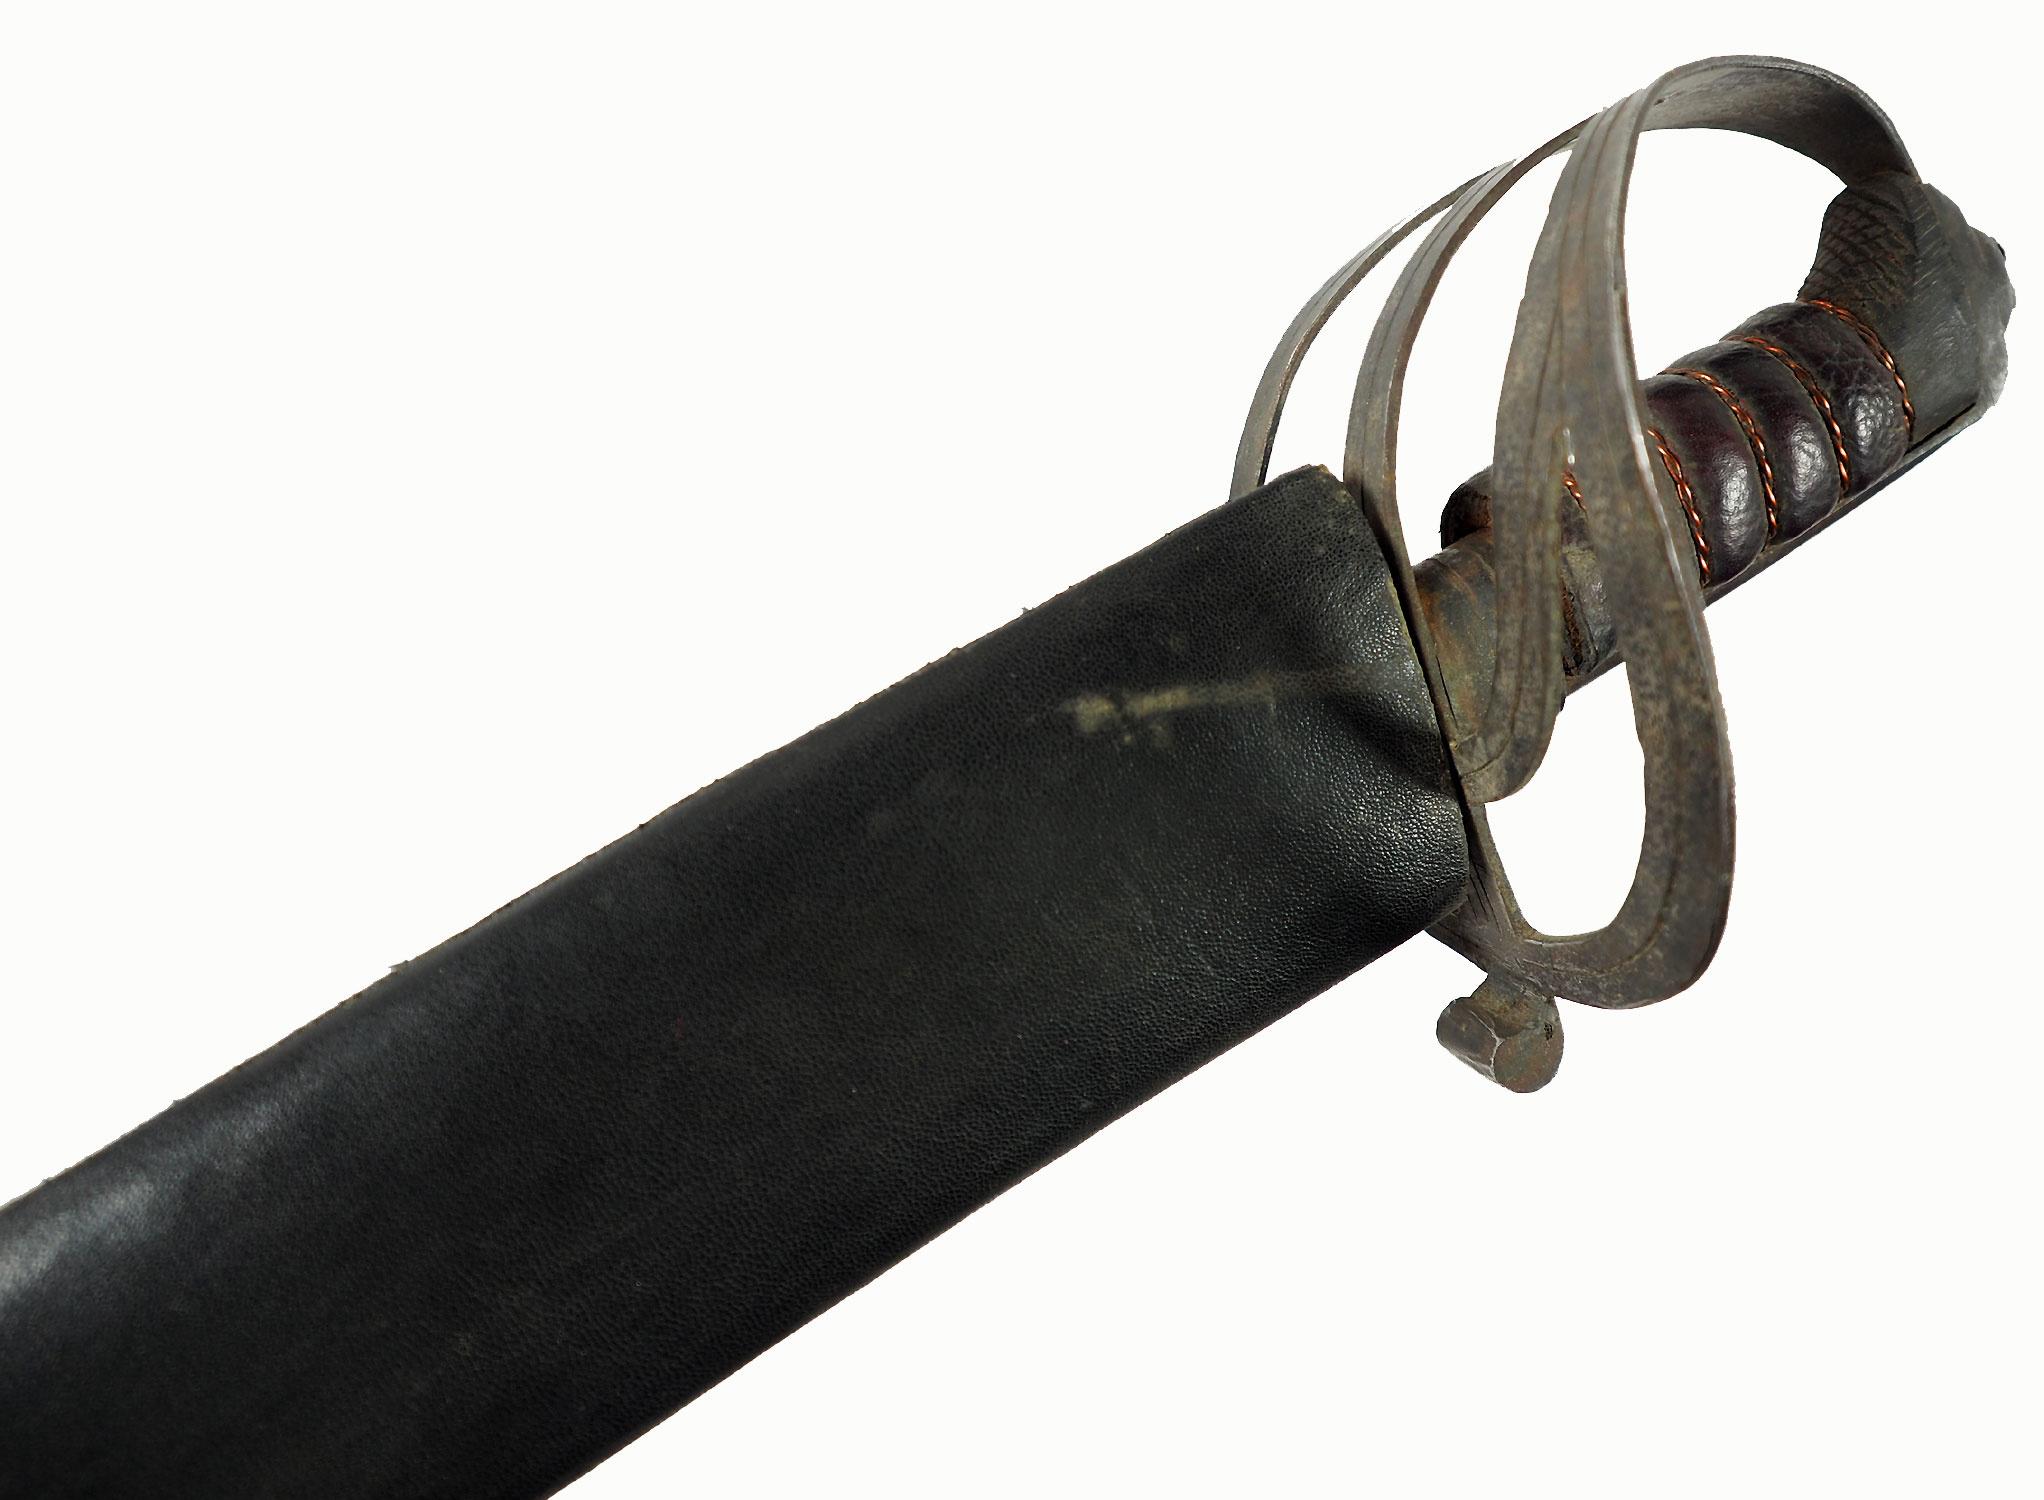 Antike Säbel messer schwert shamshir sword Knife aus Afghanistan Nr:19/ T